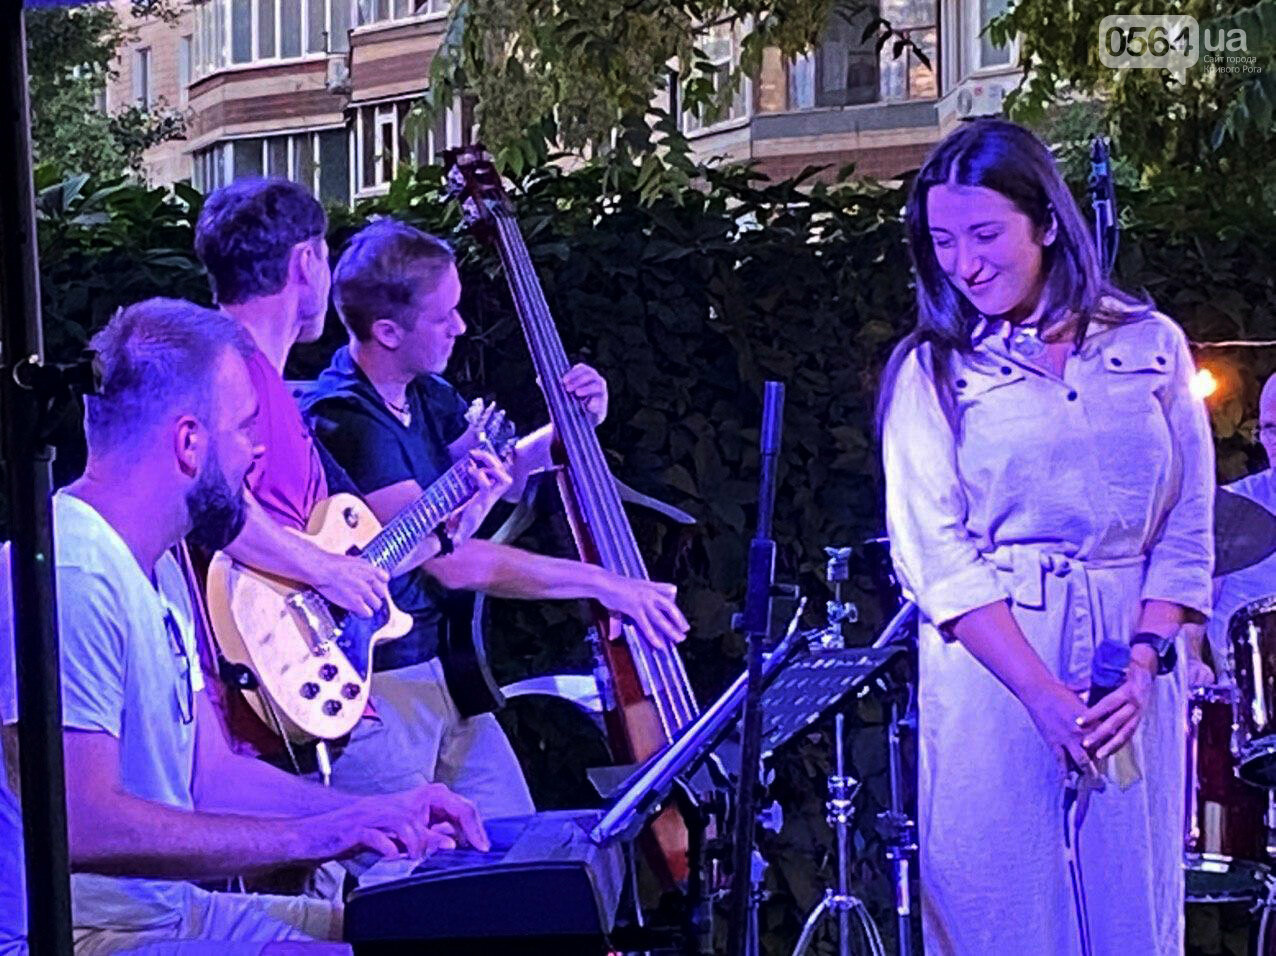 Под звездным небом криворожане наслаждались летним джазом от  Advantage Project, - ФОТО, ВИДЕО , фото-22